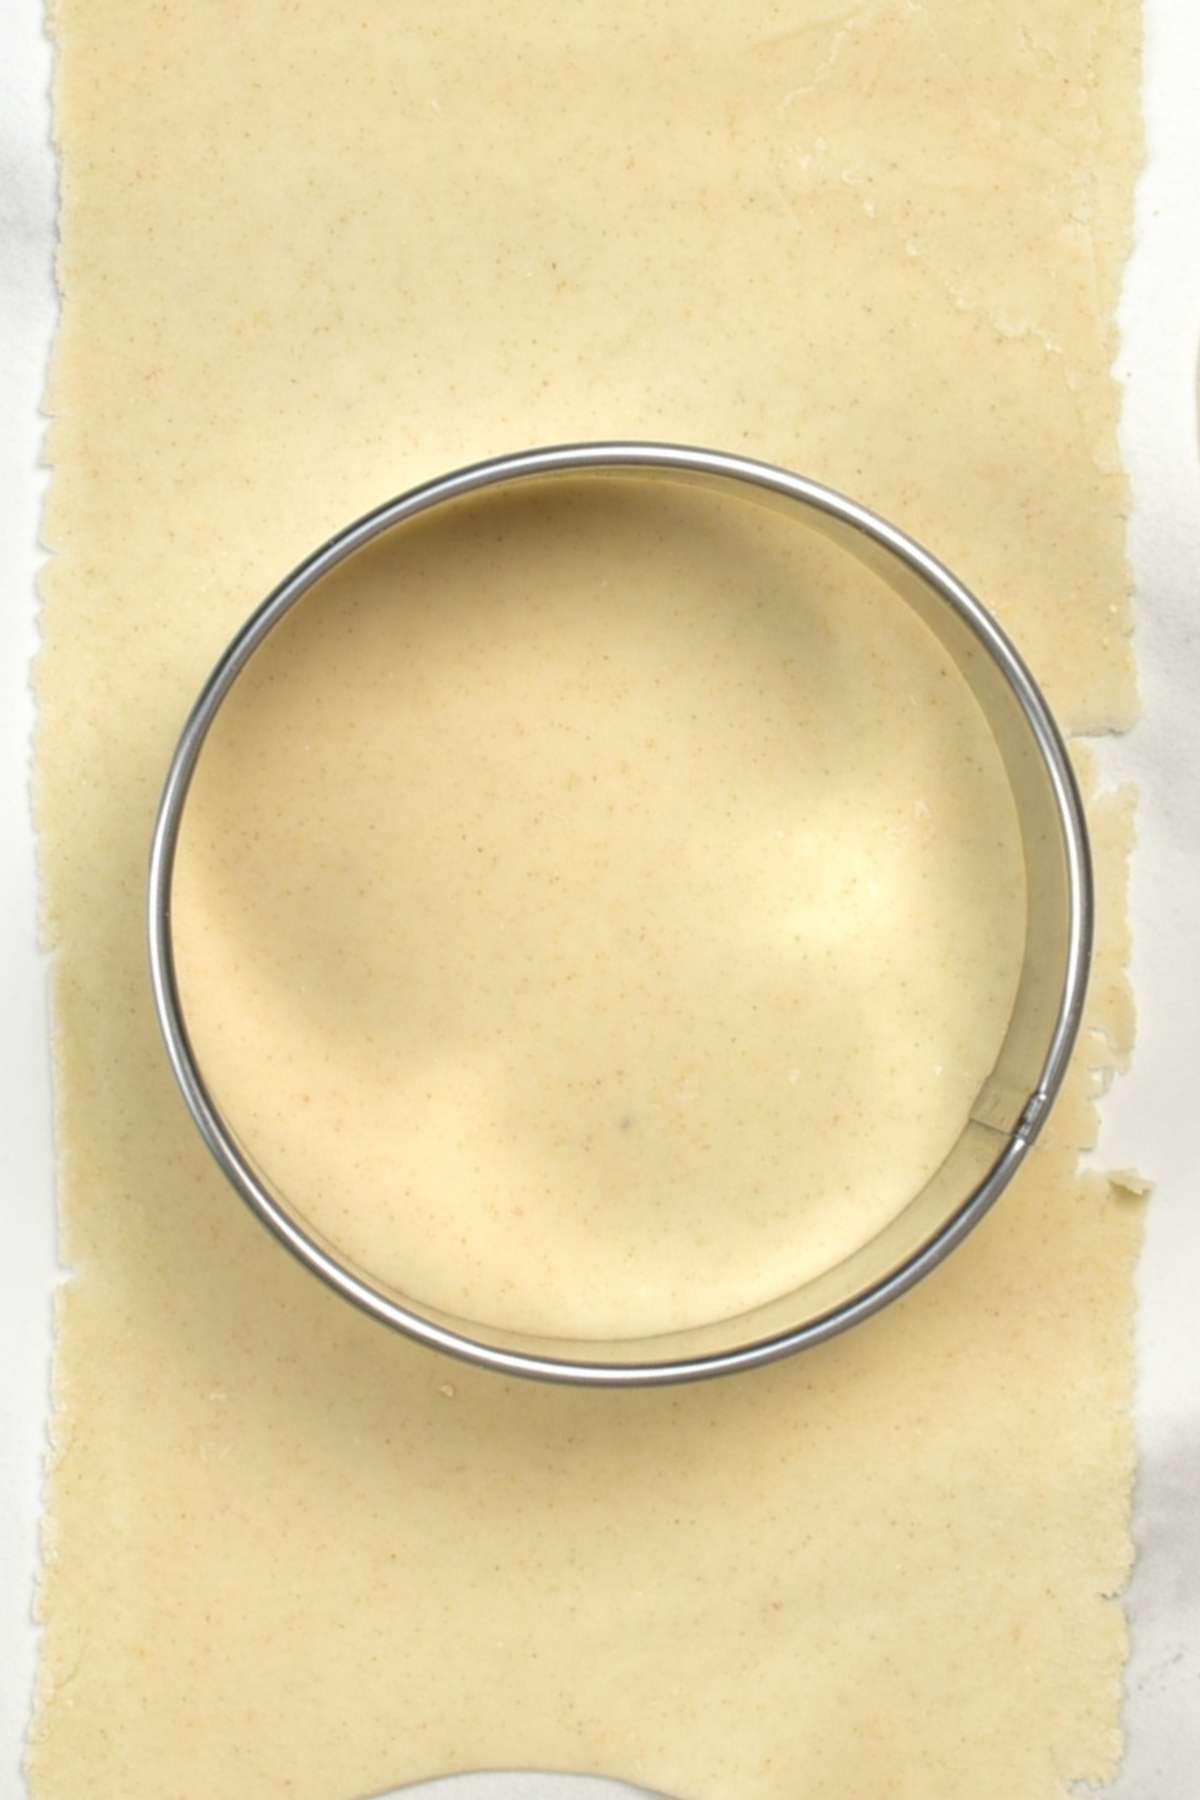 Cutting a dumpling wrapper